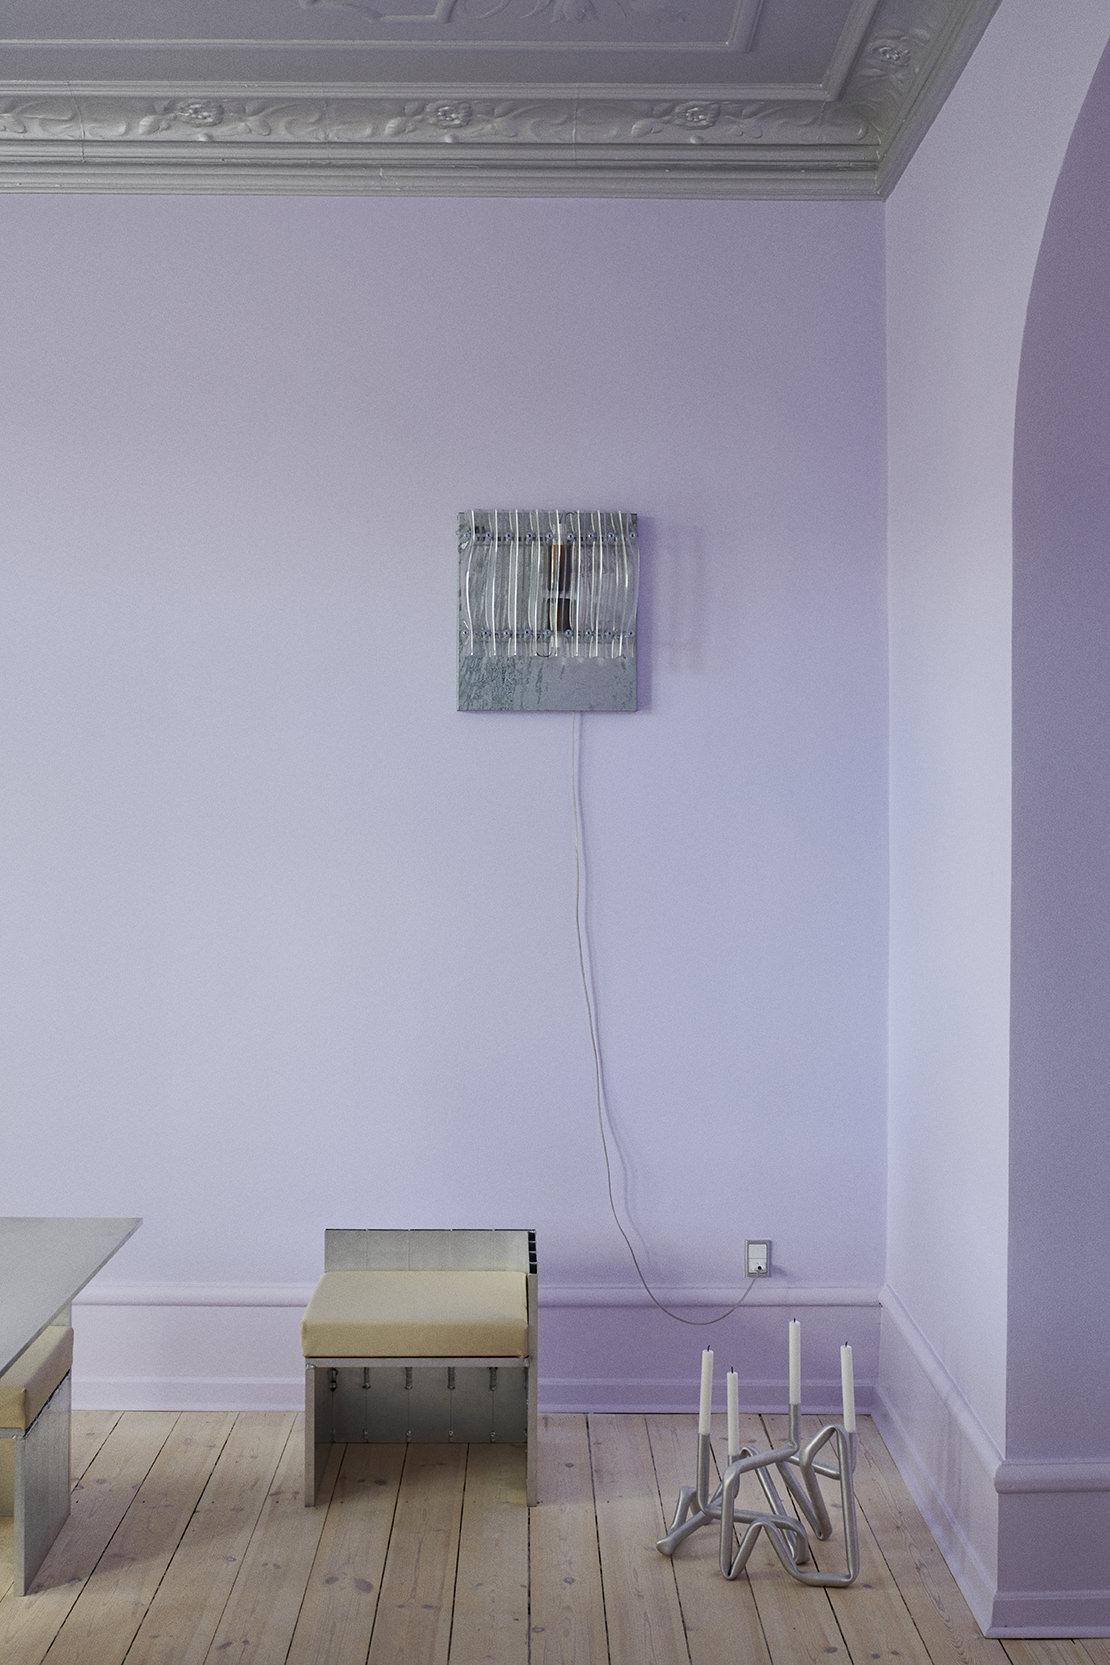 Tableau Post Service Concept Space Copenhagen Photo Michael Rygaard Yellowtrace 12